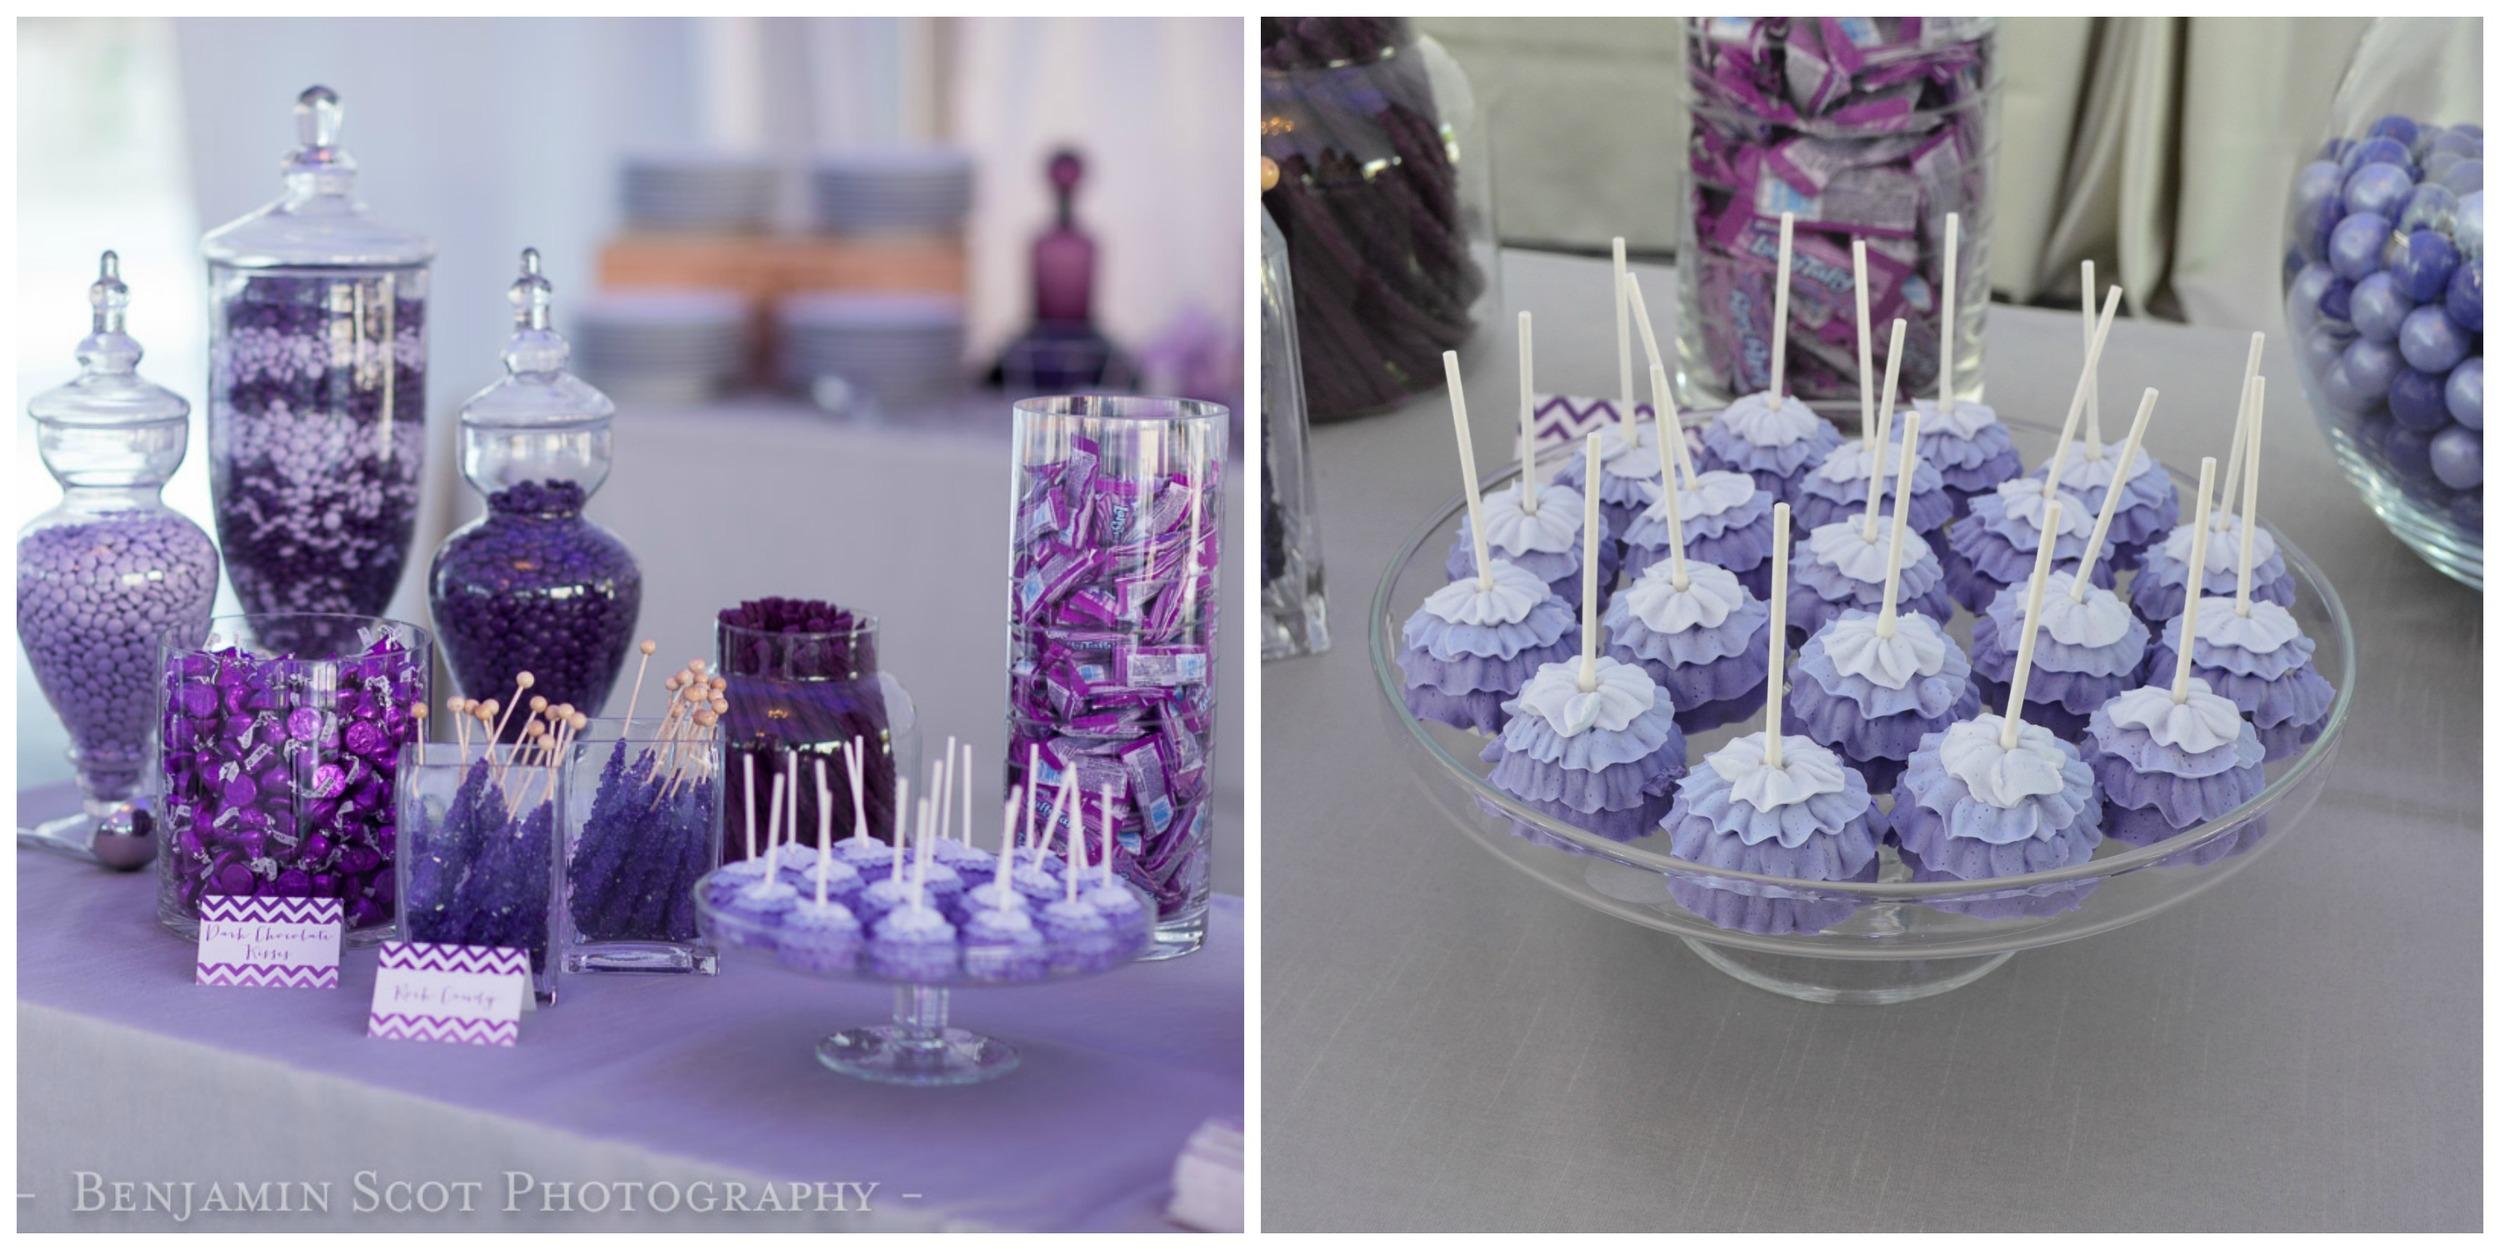 PurpleThemed Wedding Inspiration  The Overwhelmed Bride